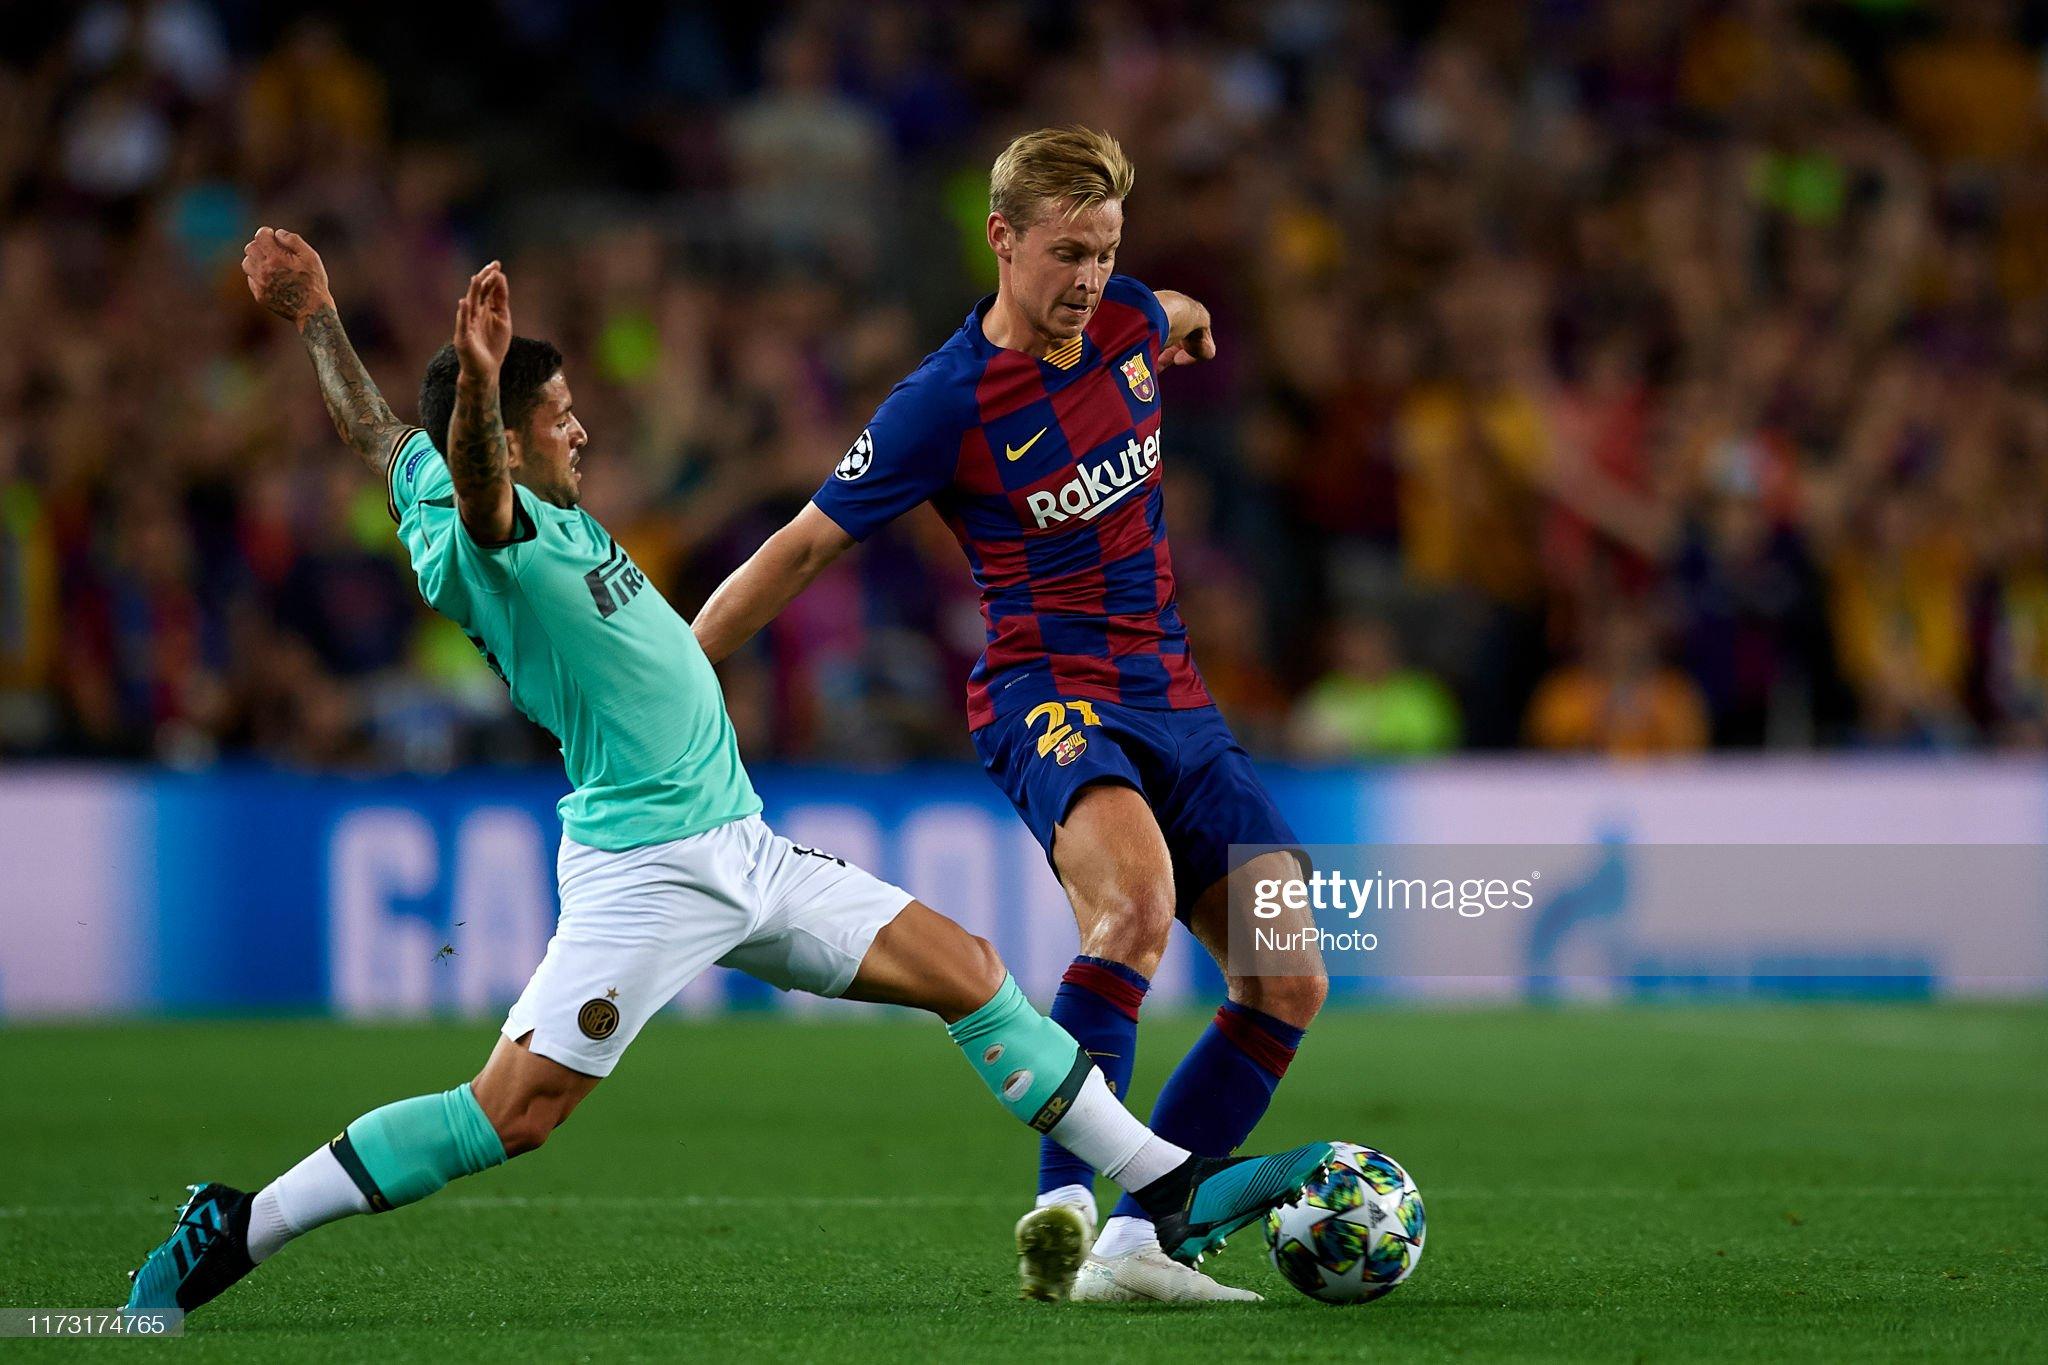 صور مباراة : برشلونة - إنتر 2-1 ( 02-10-2019 )  Frenkie-de-jong-of-barcelona-and-stefano-sensi-of-inter-of-milan-for-picture-id1173174765?s=2048x2048